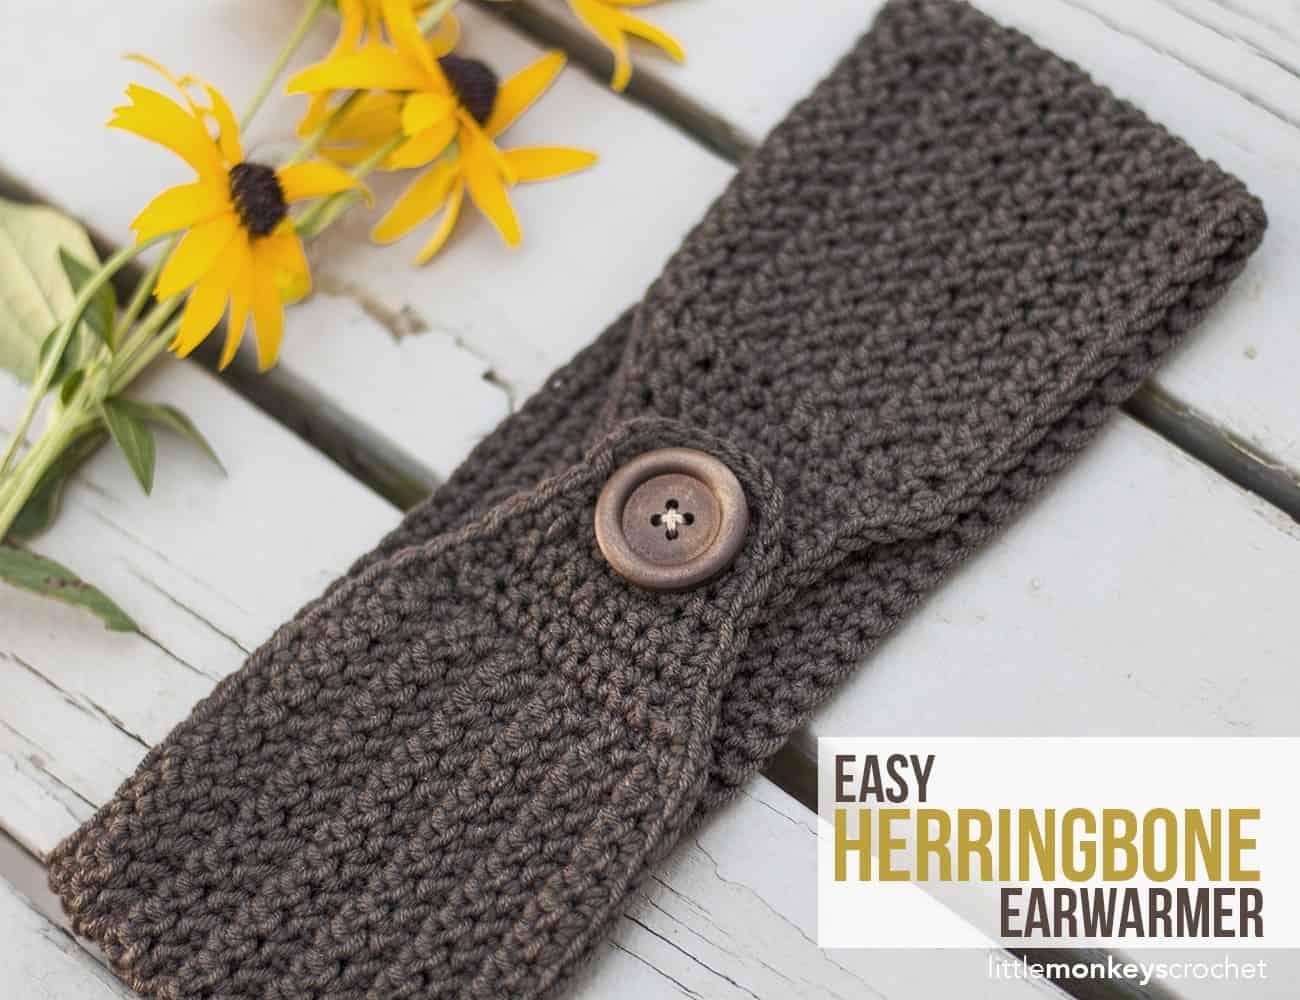 Herringbone ear warmer with a button